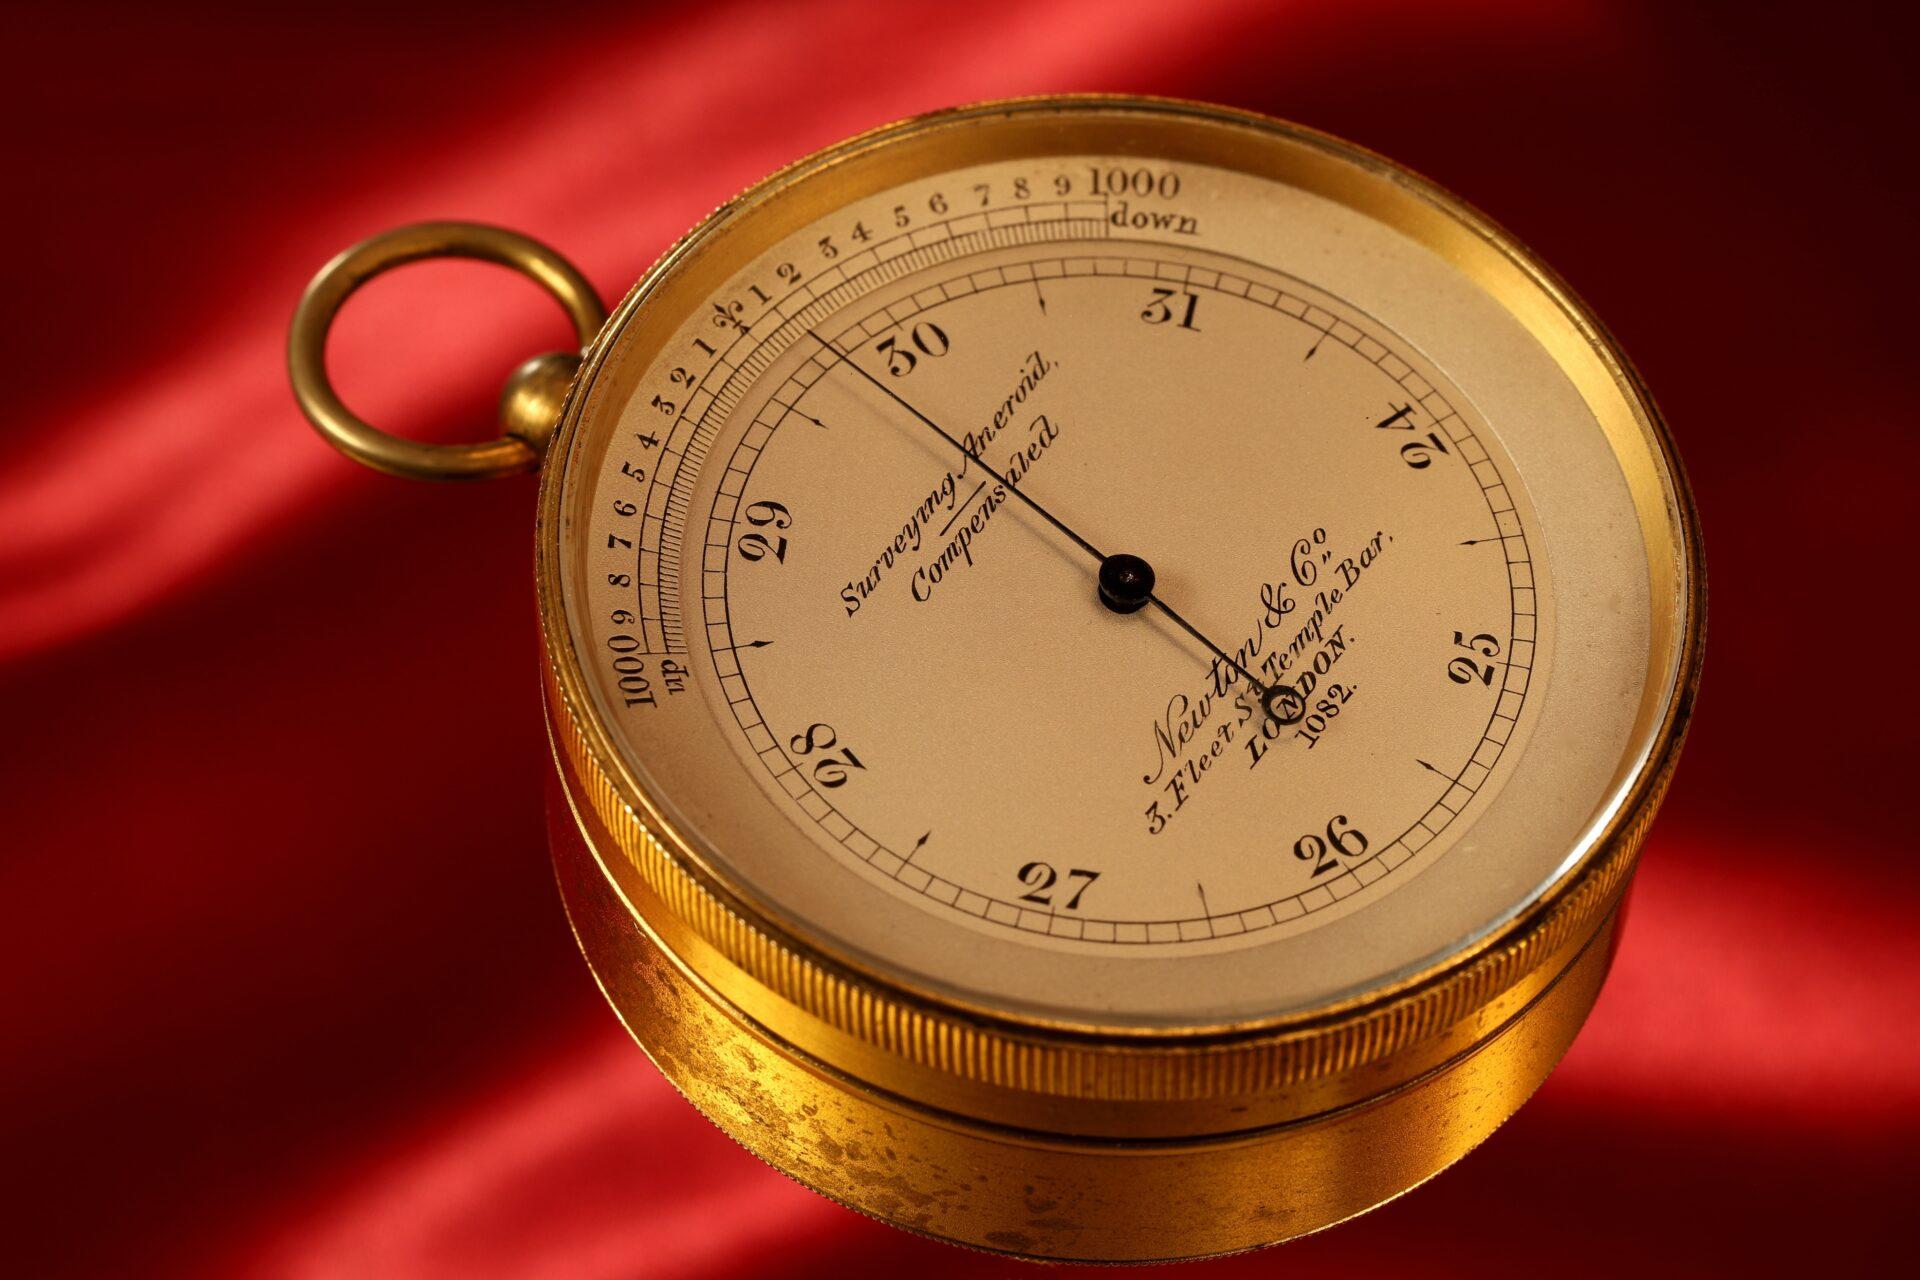 Image of Newton Pocket Barometer No 1082 taken from lefthand side